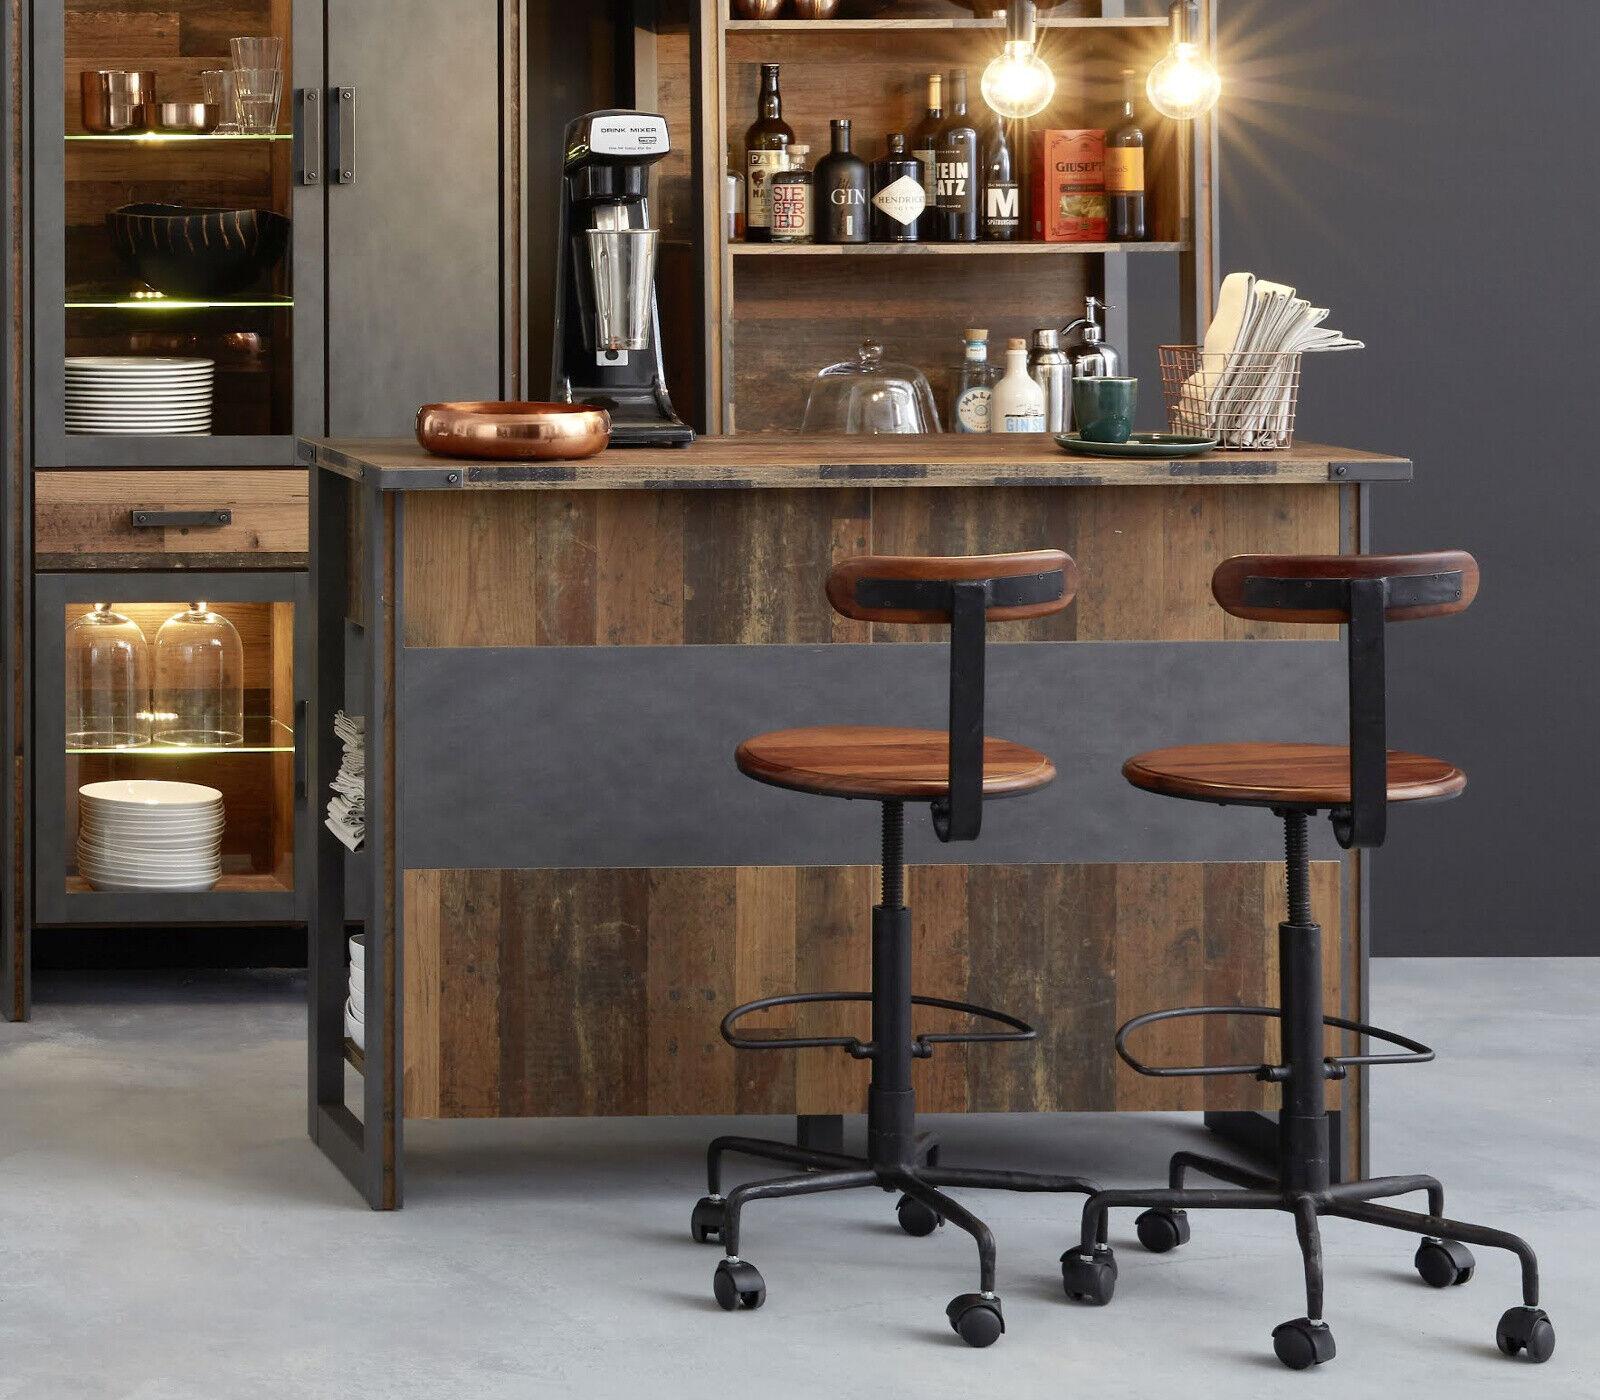 Bar Theke Hausbar Used Wood Vintage grau Matera Stehtisch Bartresen 140 cm Prime